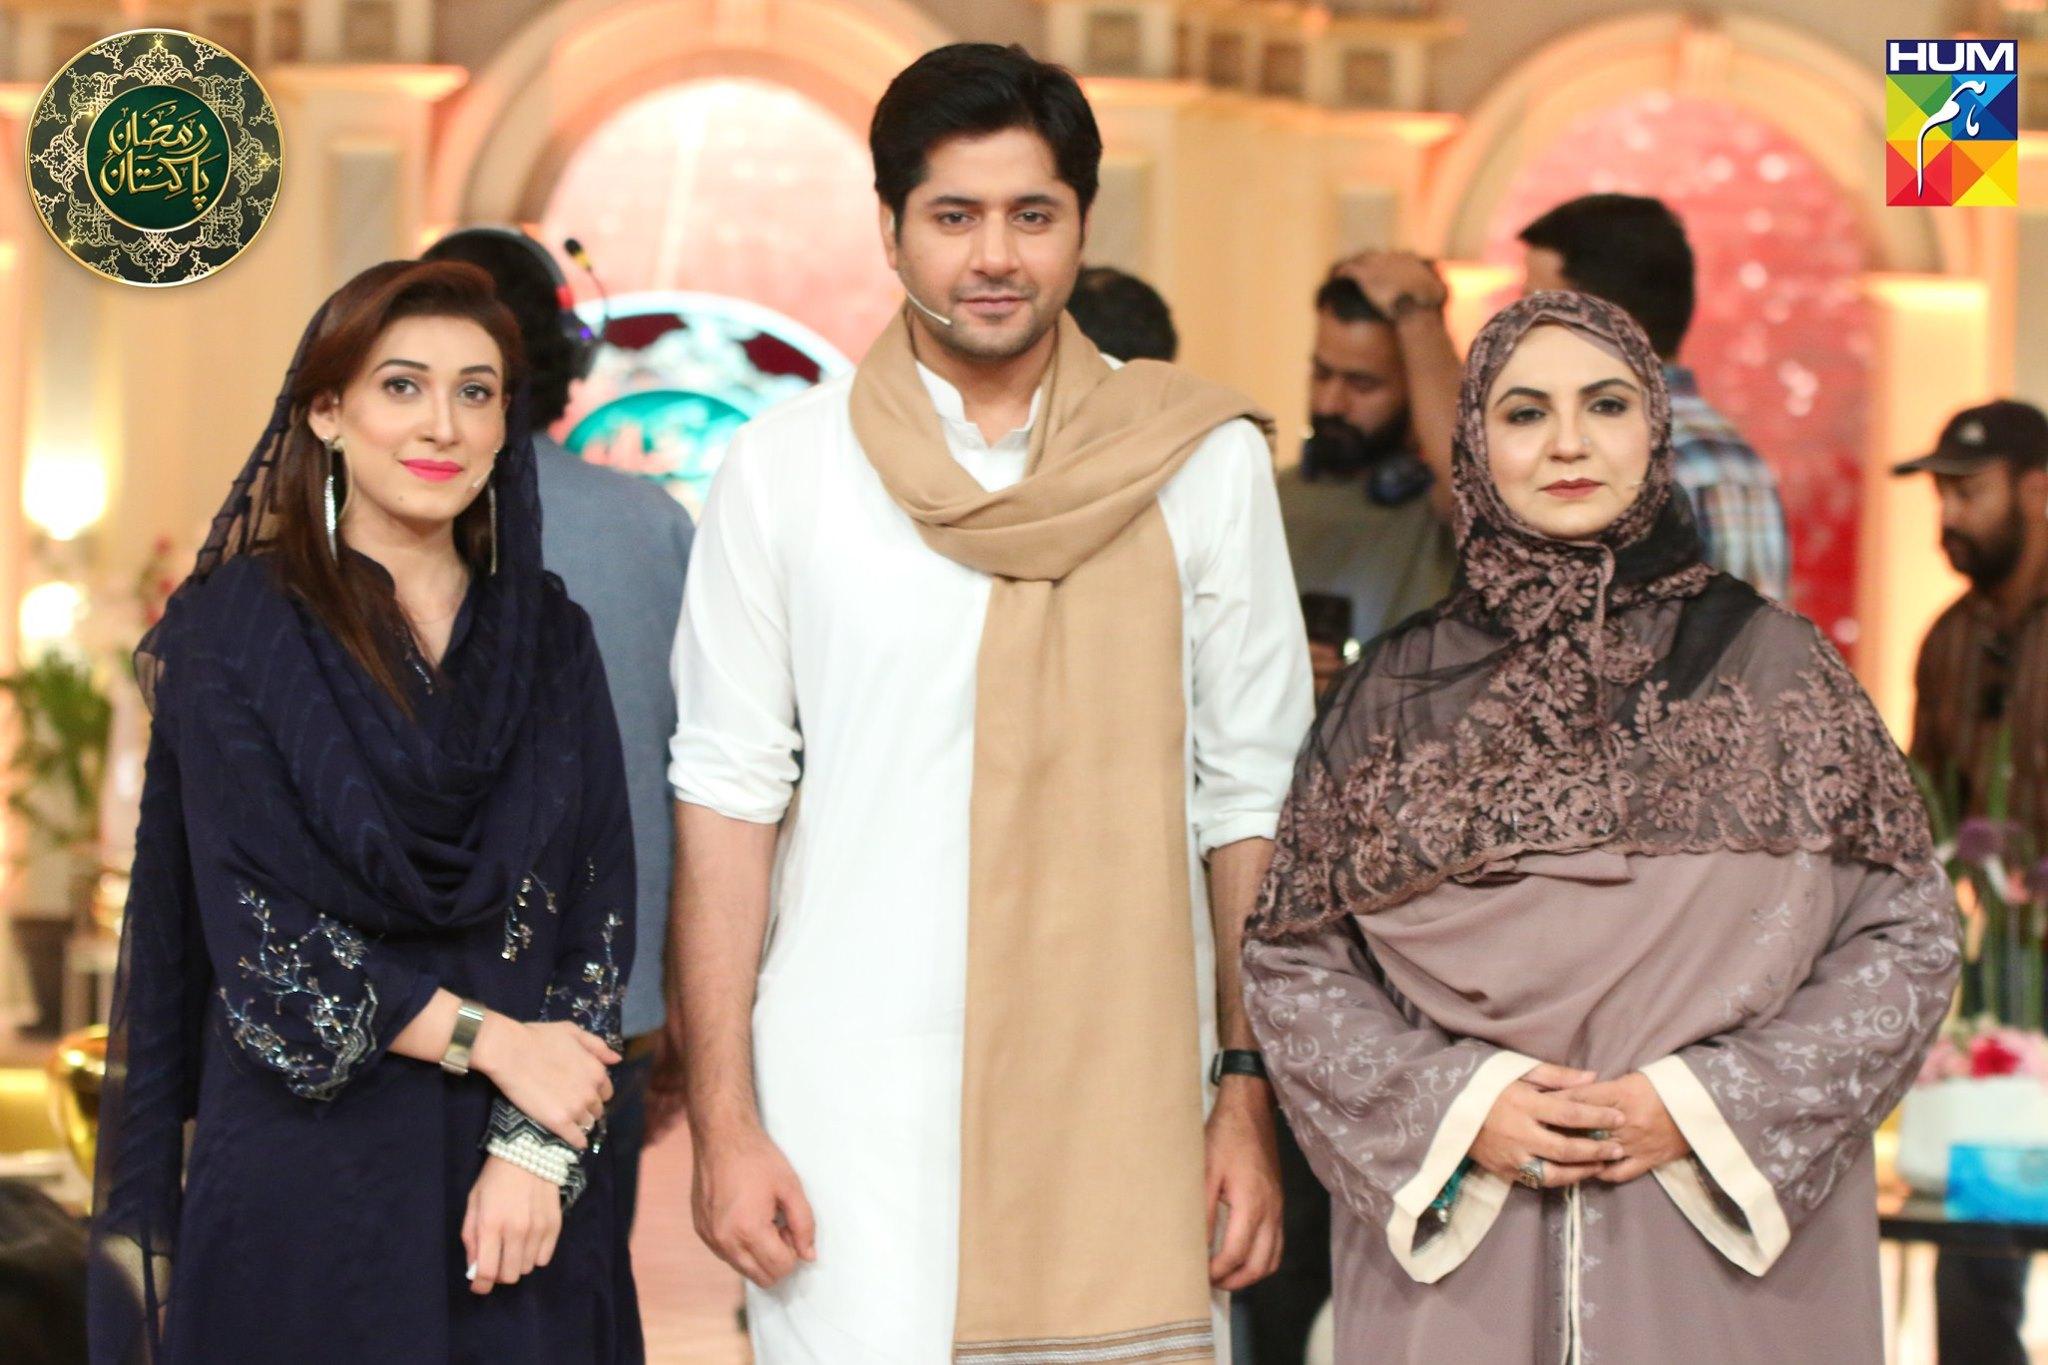 Actor Imran Ashraf Appeared in Ramzan Pakistan Transmission